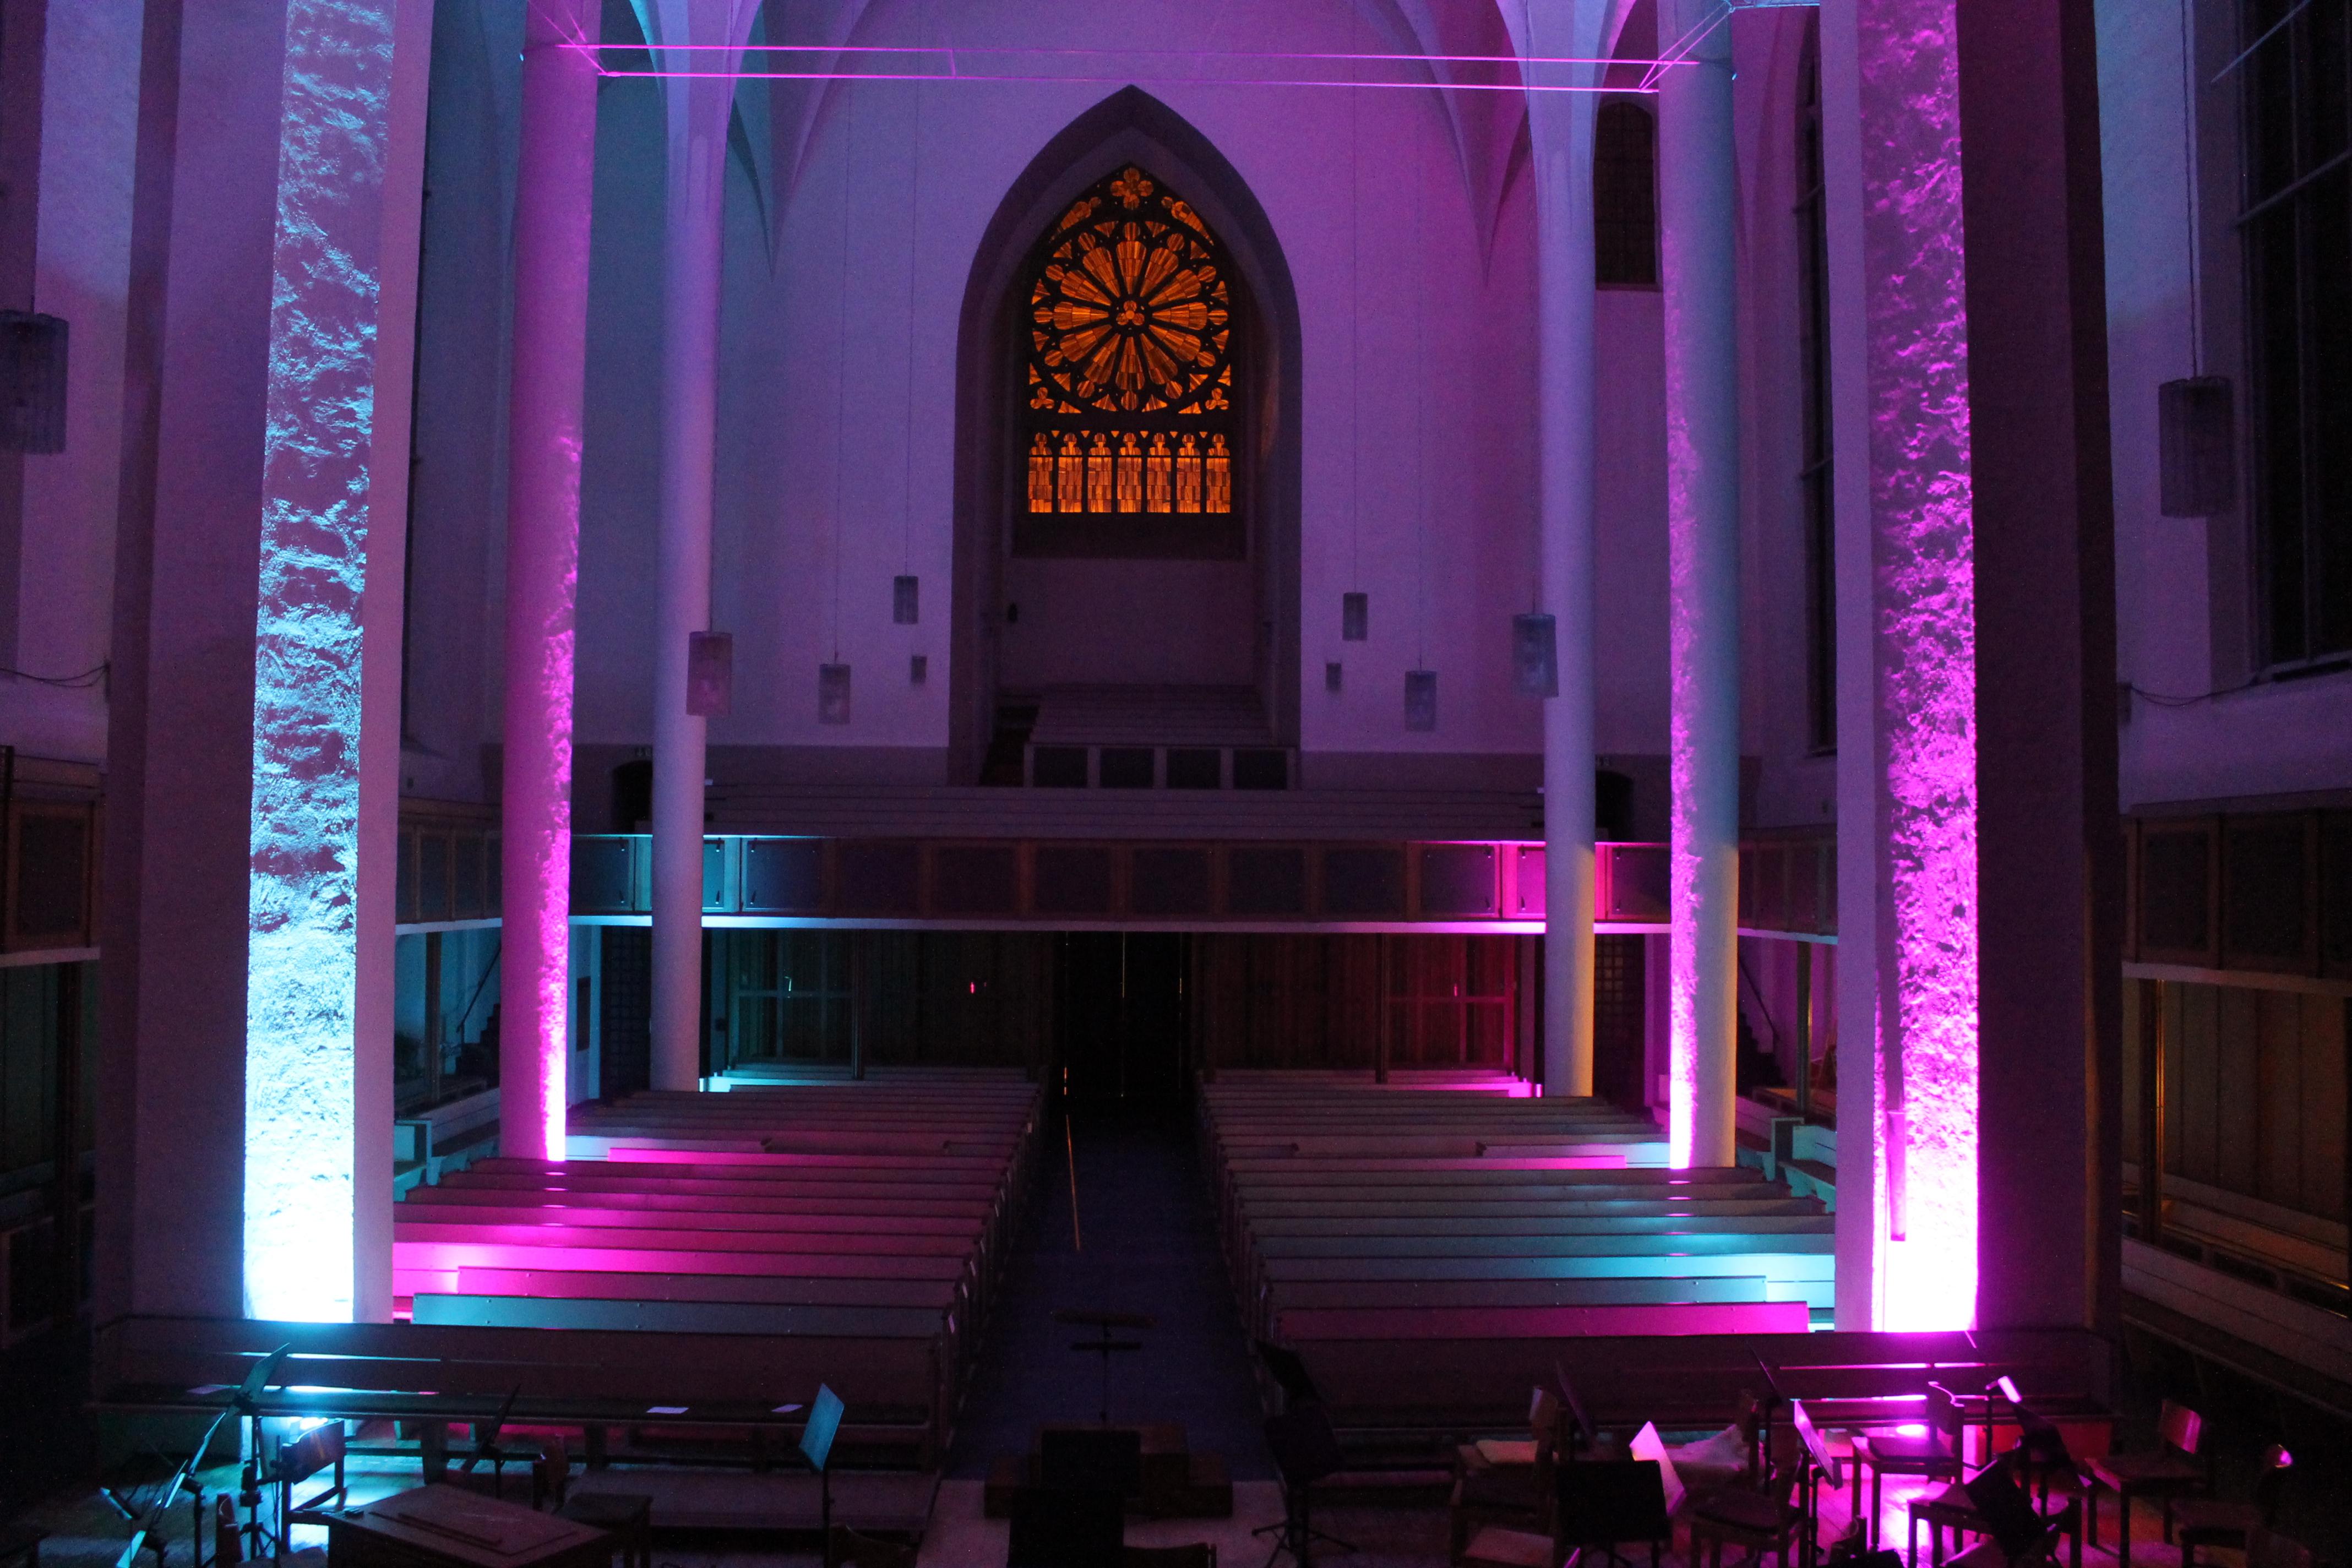 19-12-2018-Kirche_026